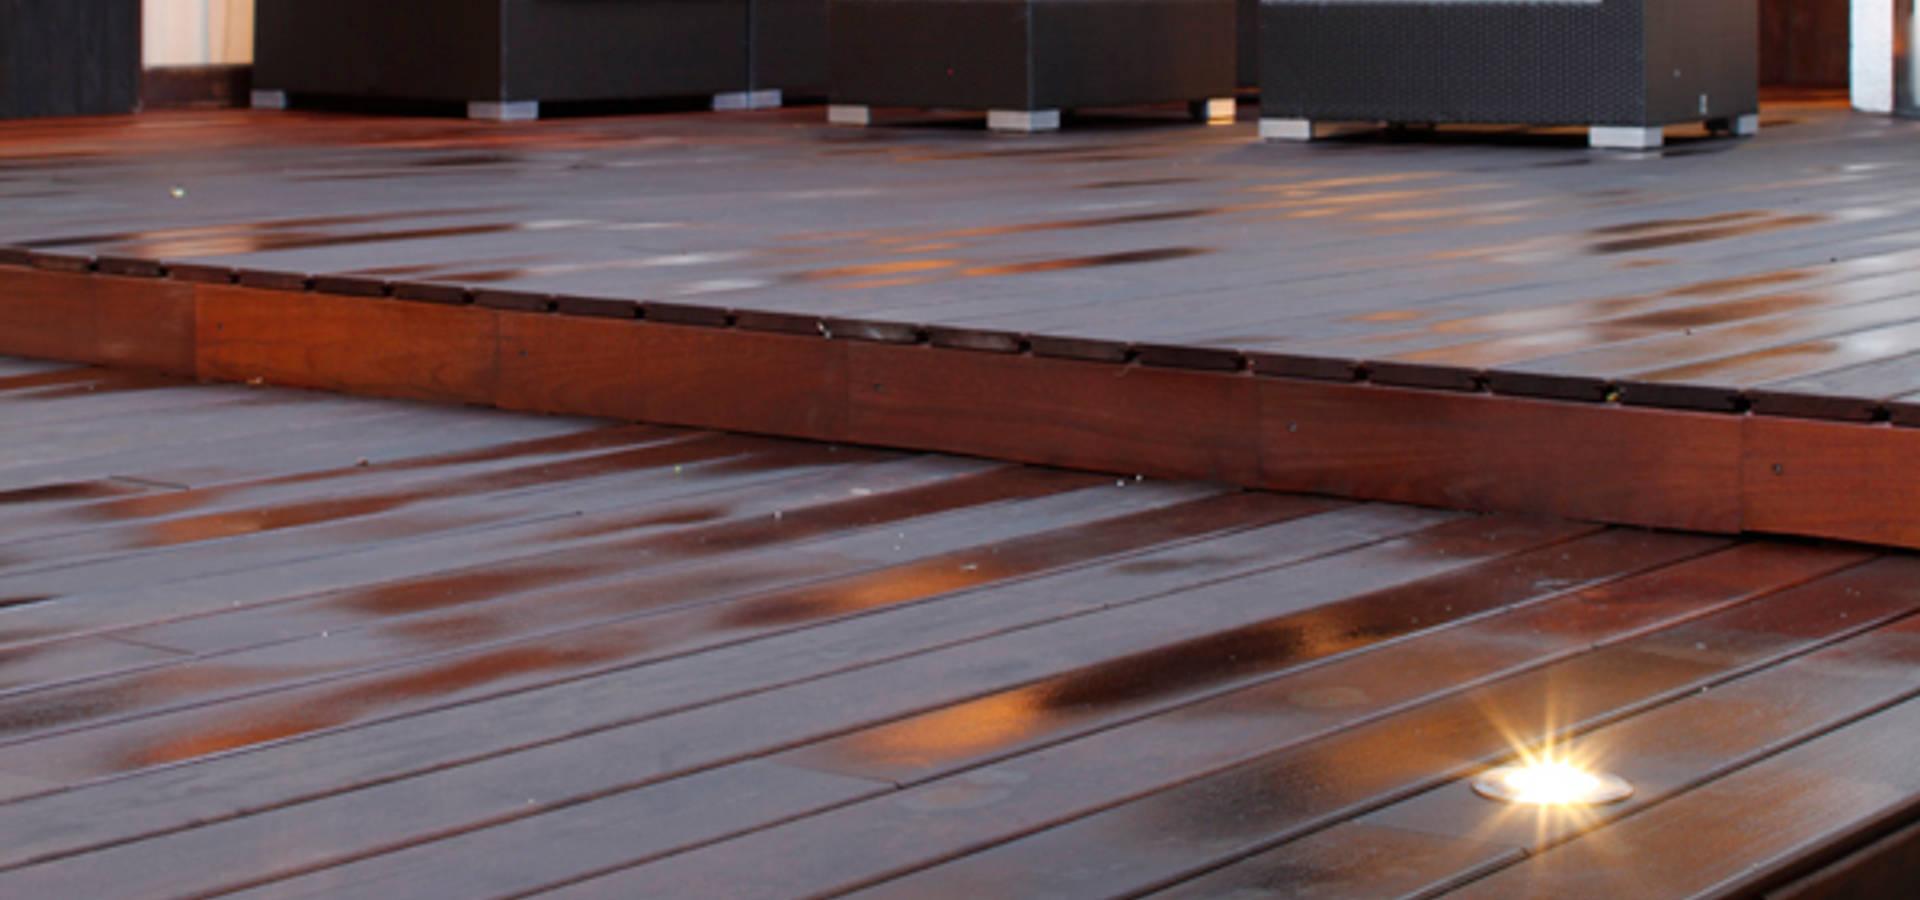 bs holzdesign gmbh terrassen patios au enbereich in m nchen homify. Black Bedroom Furniture Sets. Home Design Ideas